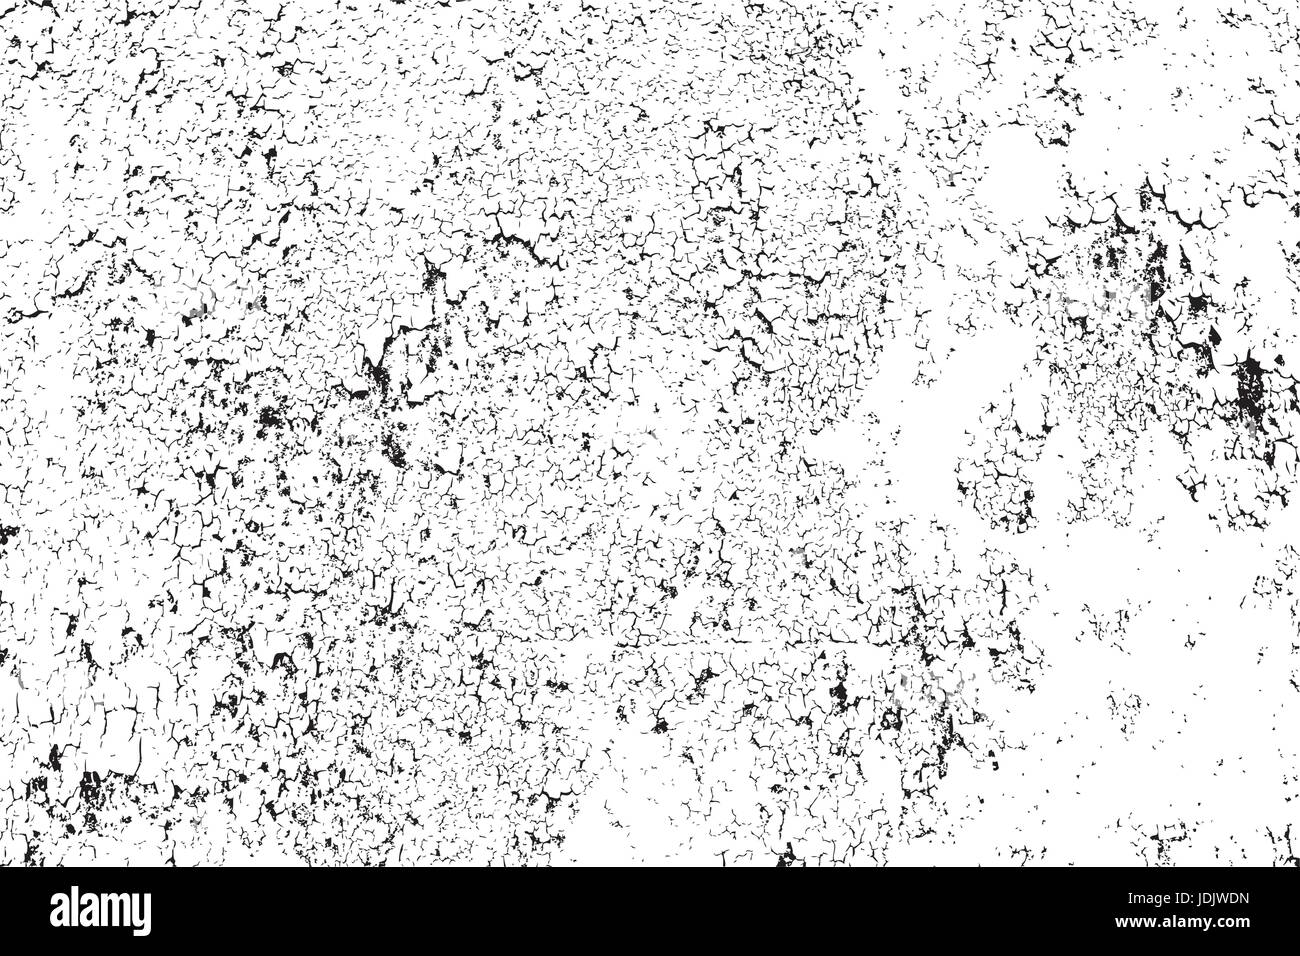 Abstracto textura agrietada plantilla - fácil crear efectos ...